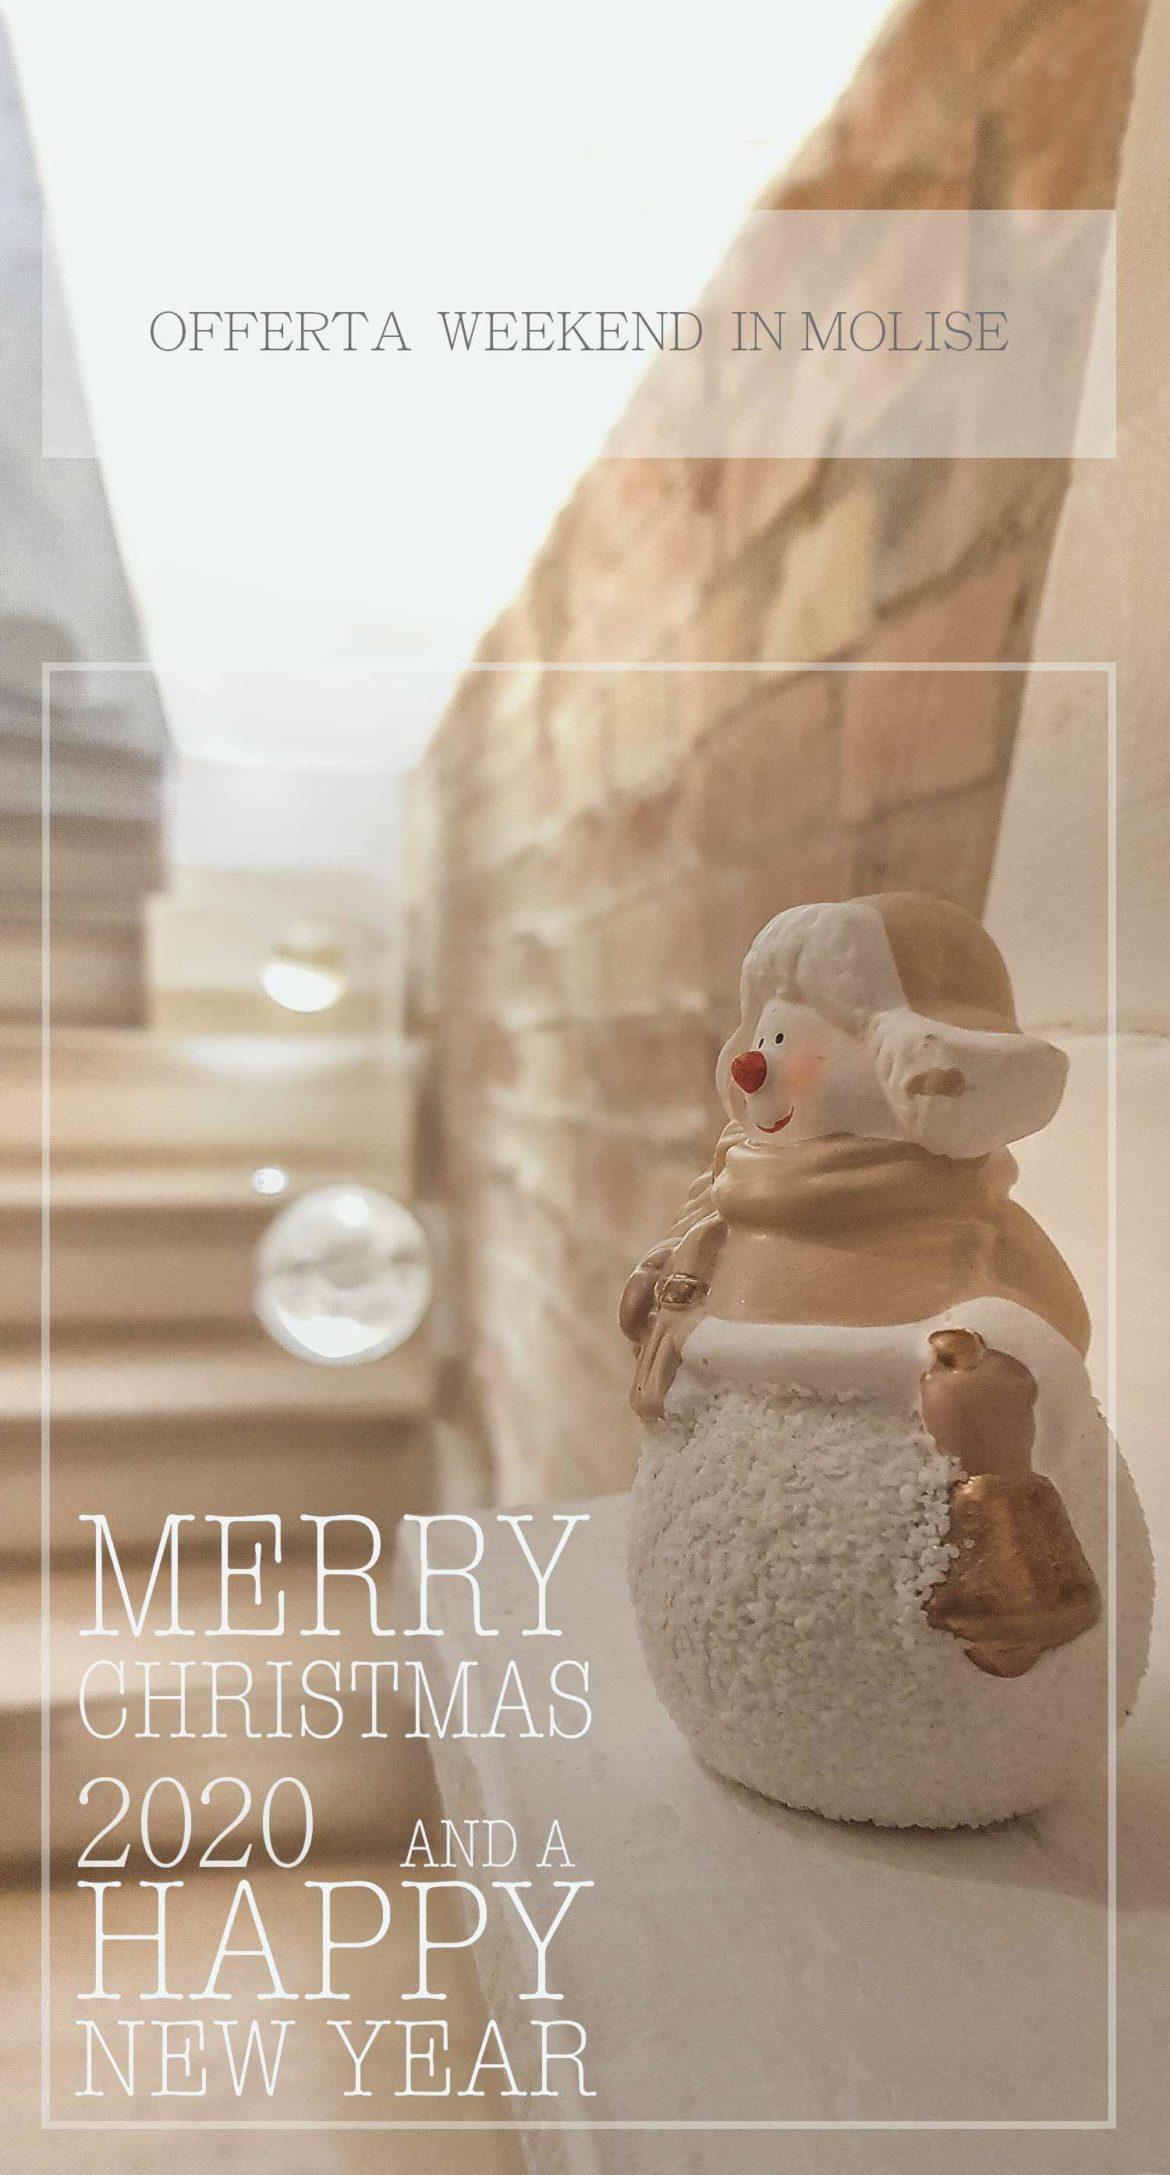 Offerta di Natale 2019 a Termoli